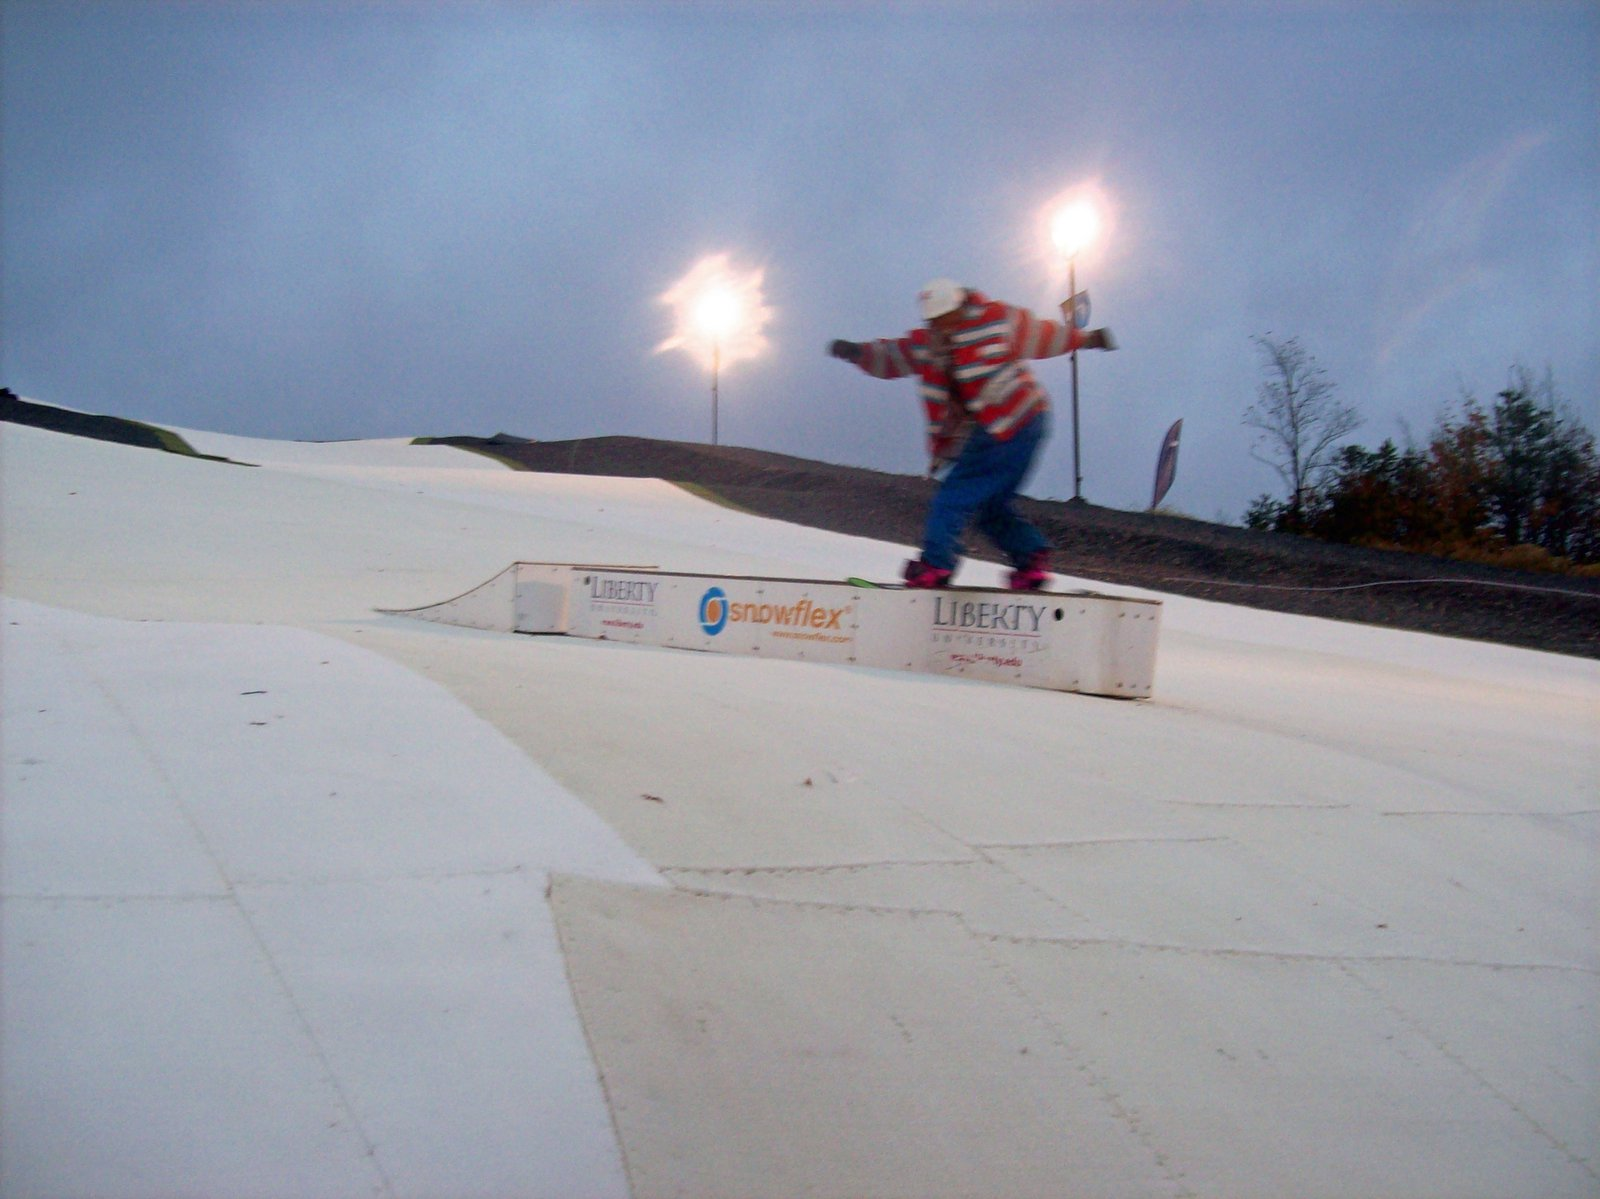 Flat Box snowflex park